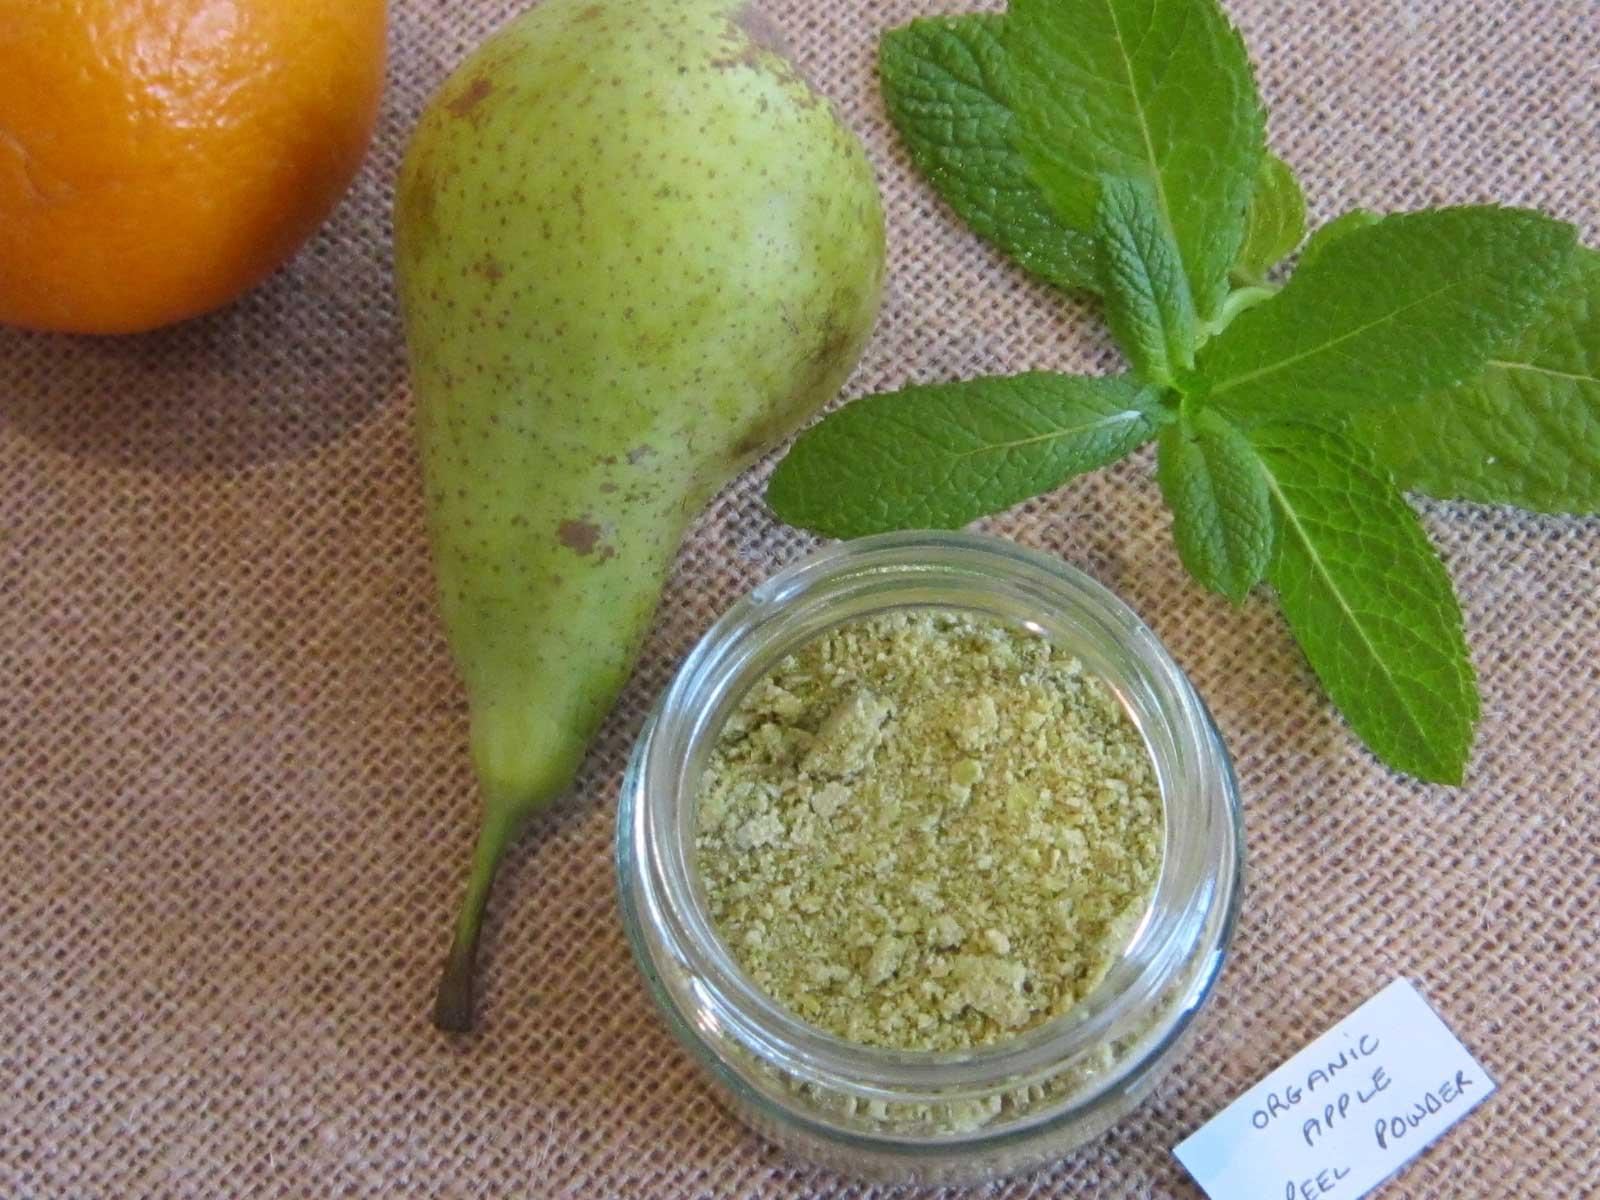 Apple Skin Powder